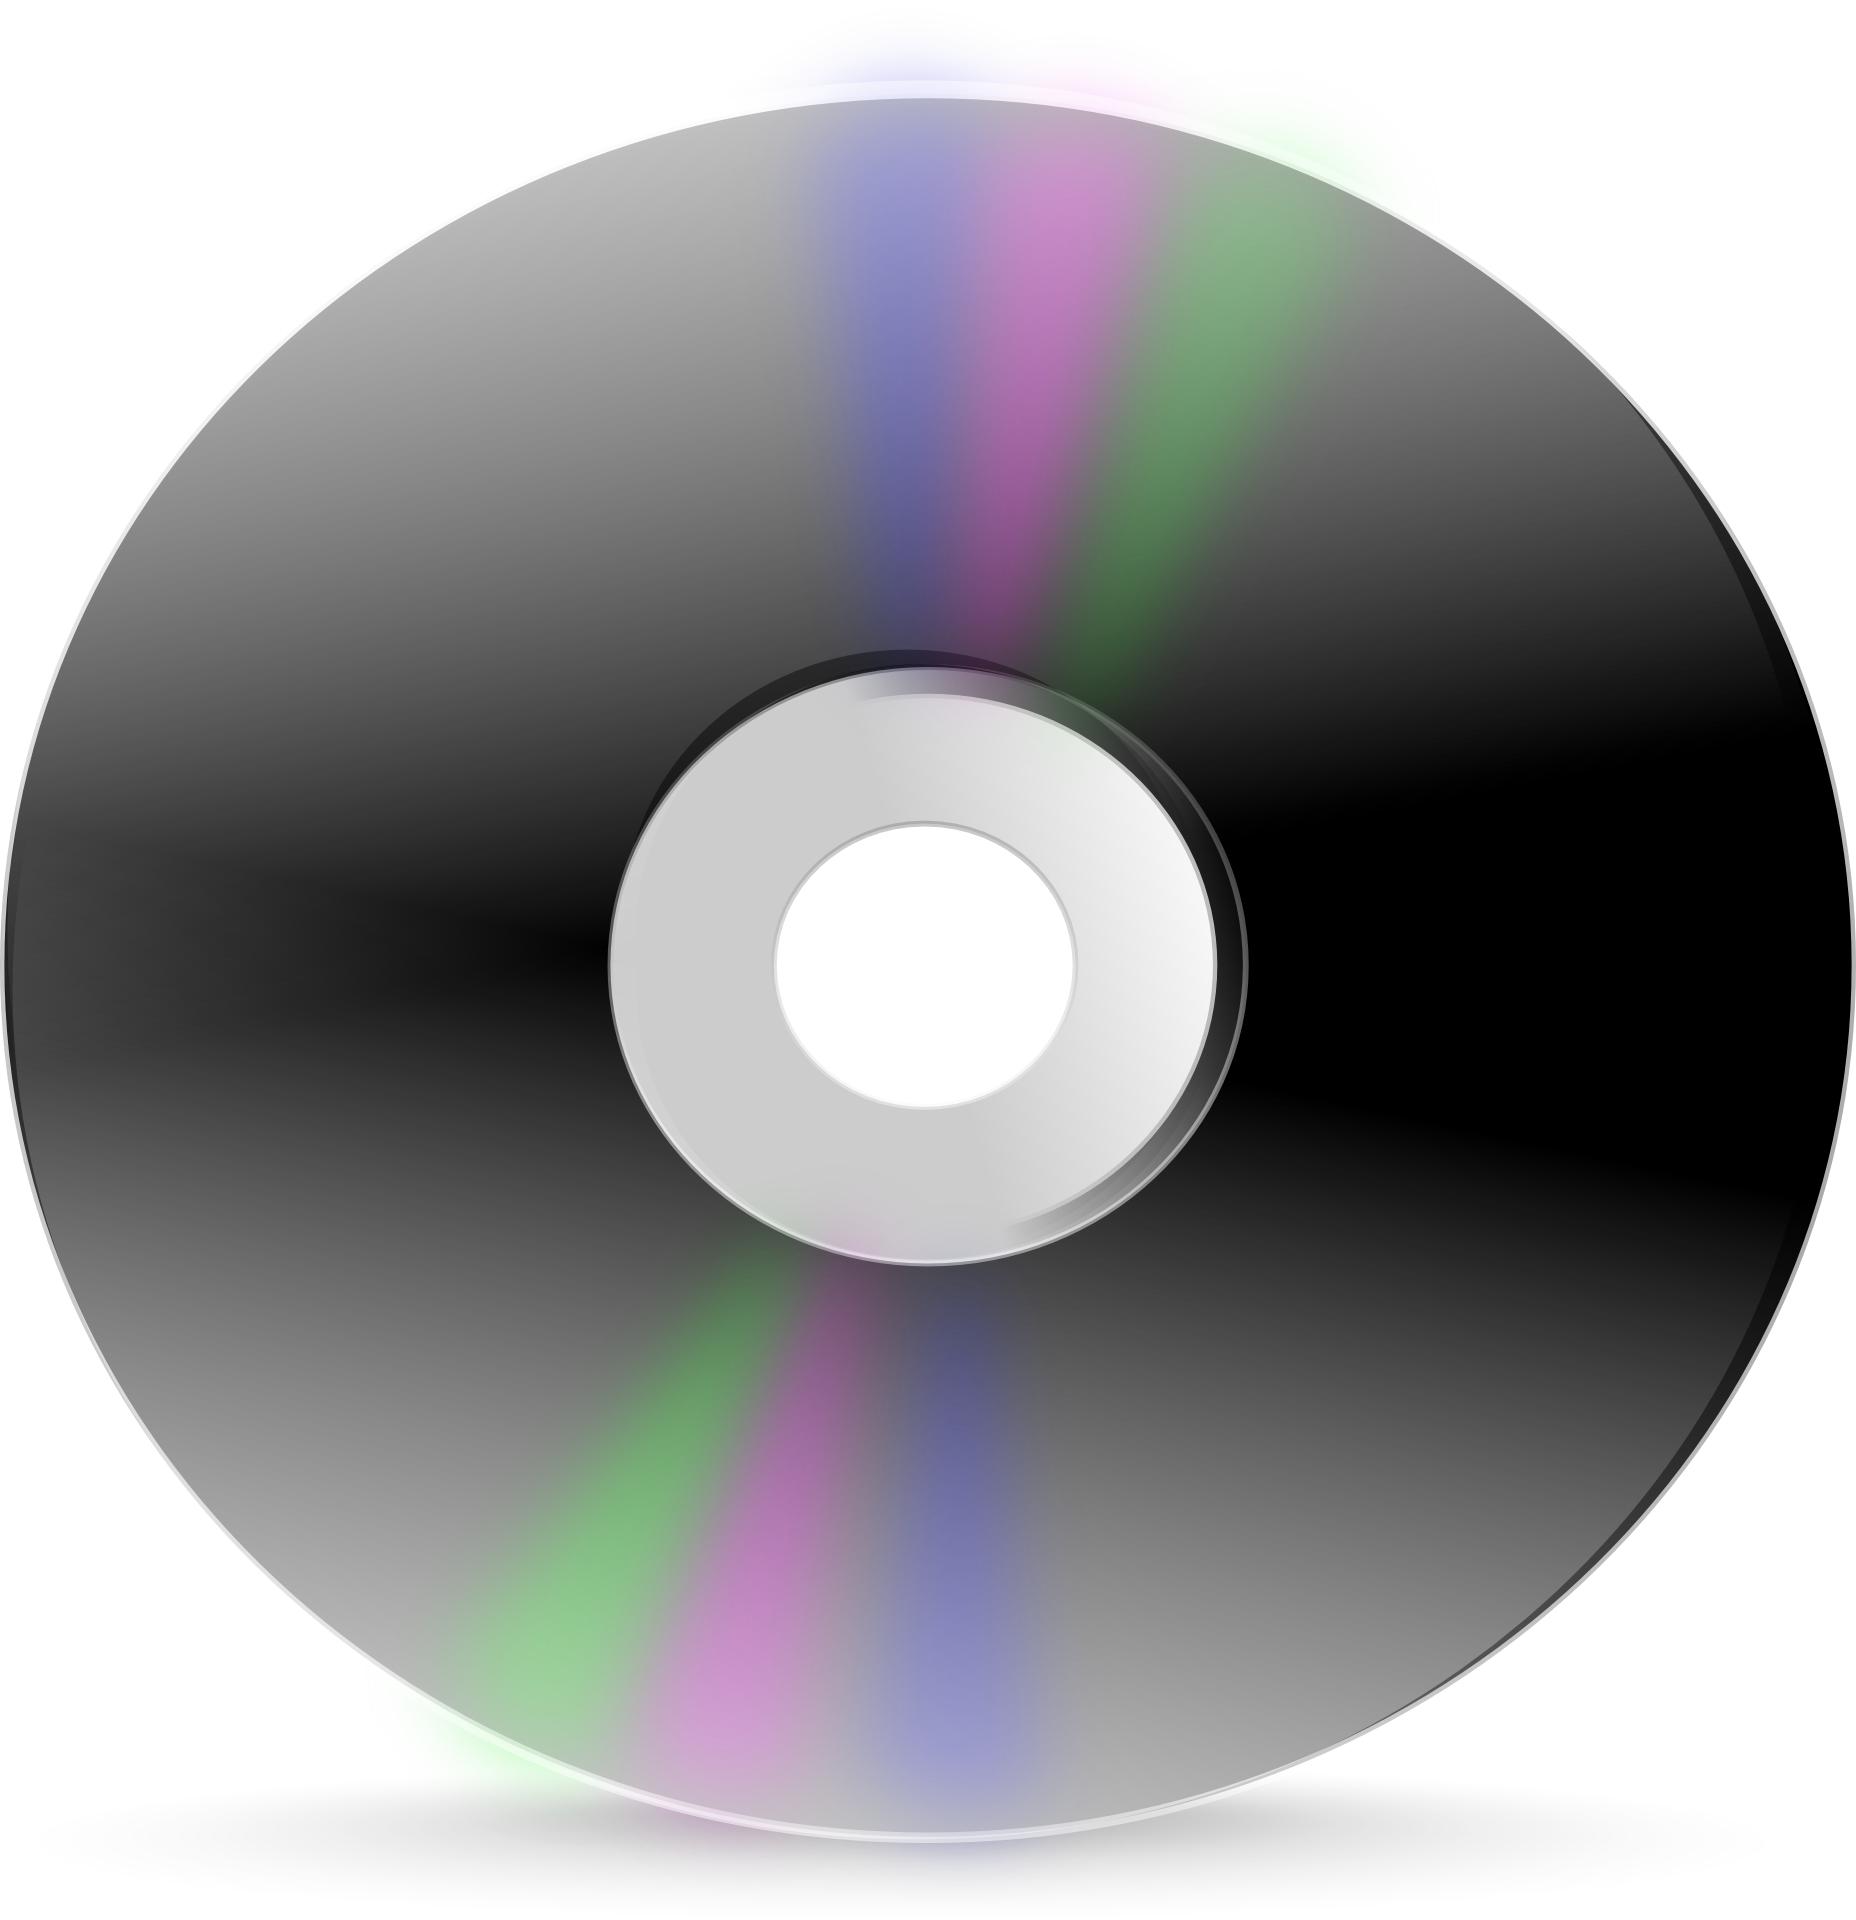 Gray DVD disk vector,CD Disk